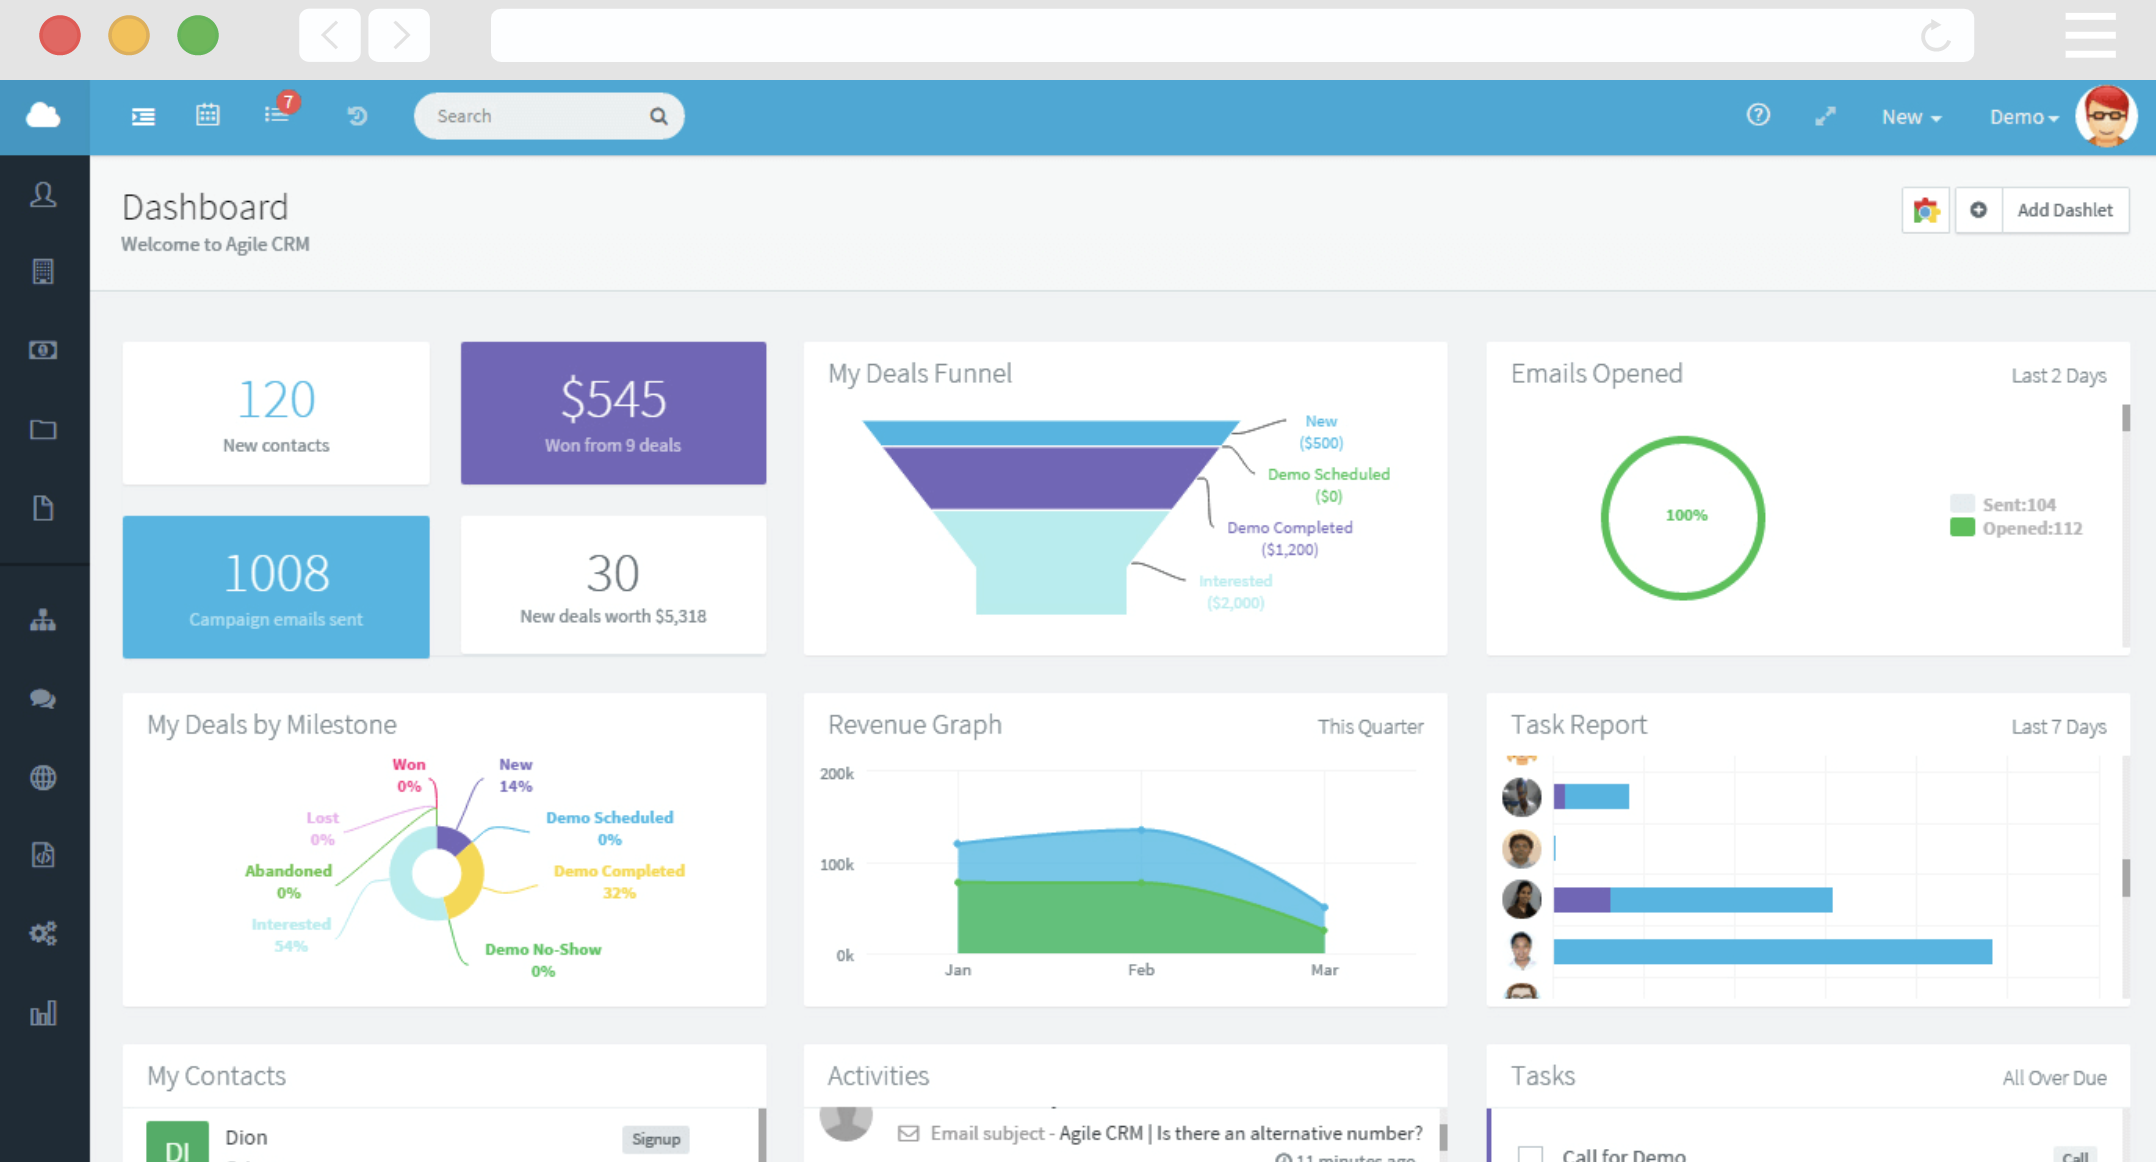 Agile CRM user-friendly dashboard report